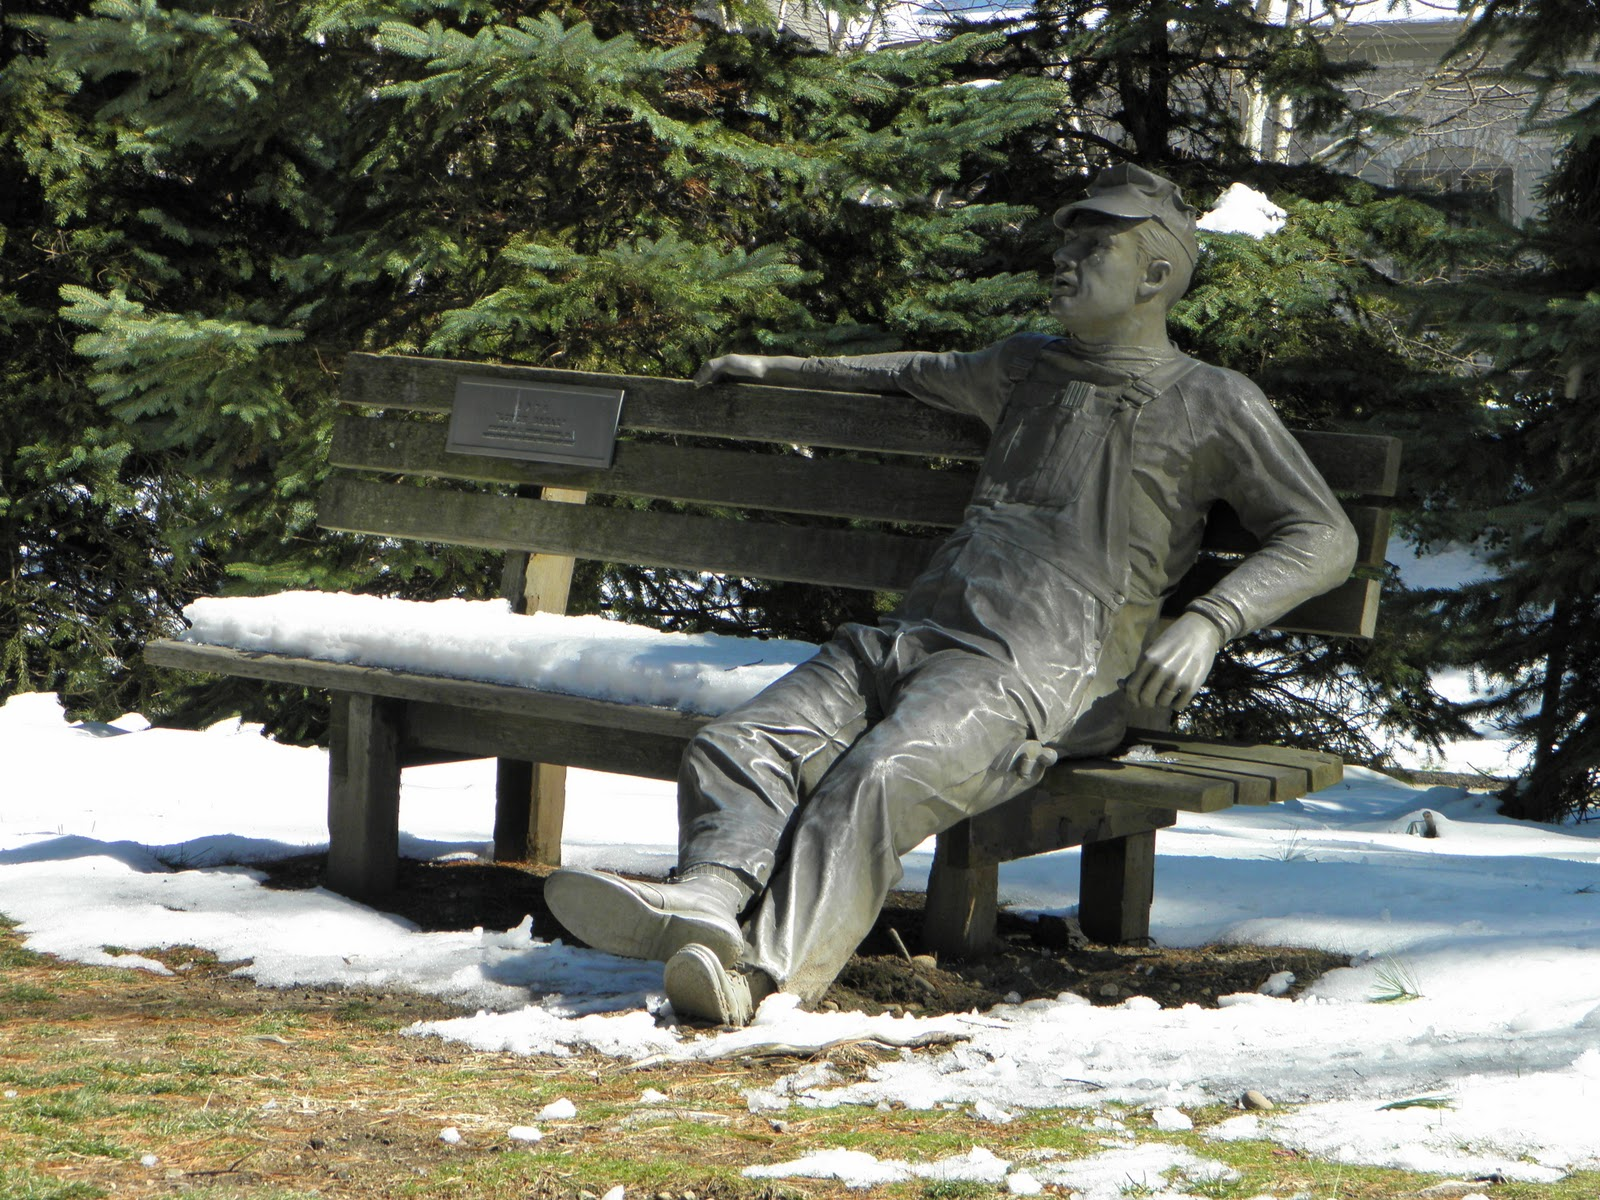 http://2.bp.blogspot.com/-4_37sJ4AZcg/TZkoP-abrUI/AAAAAAAAEQo/PuFurjba_ws/s1600/3-26+man+on+bench.jpg